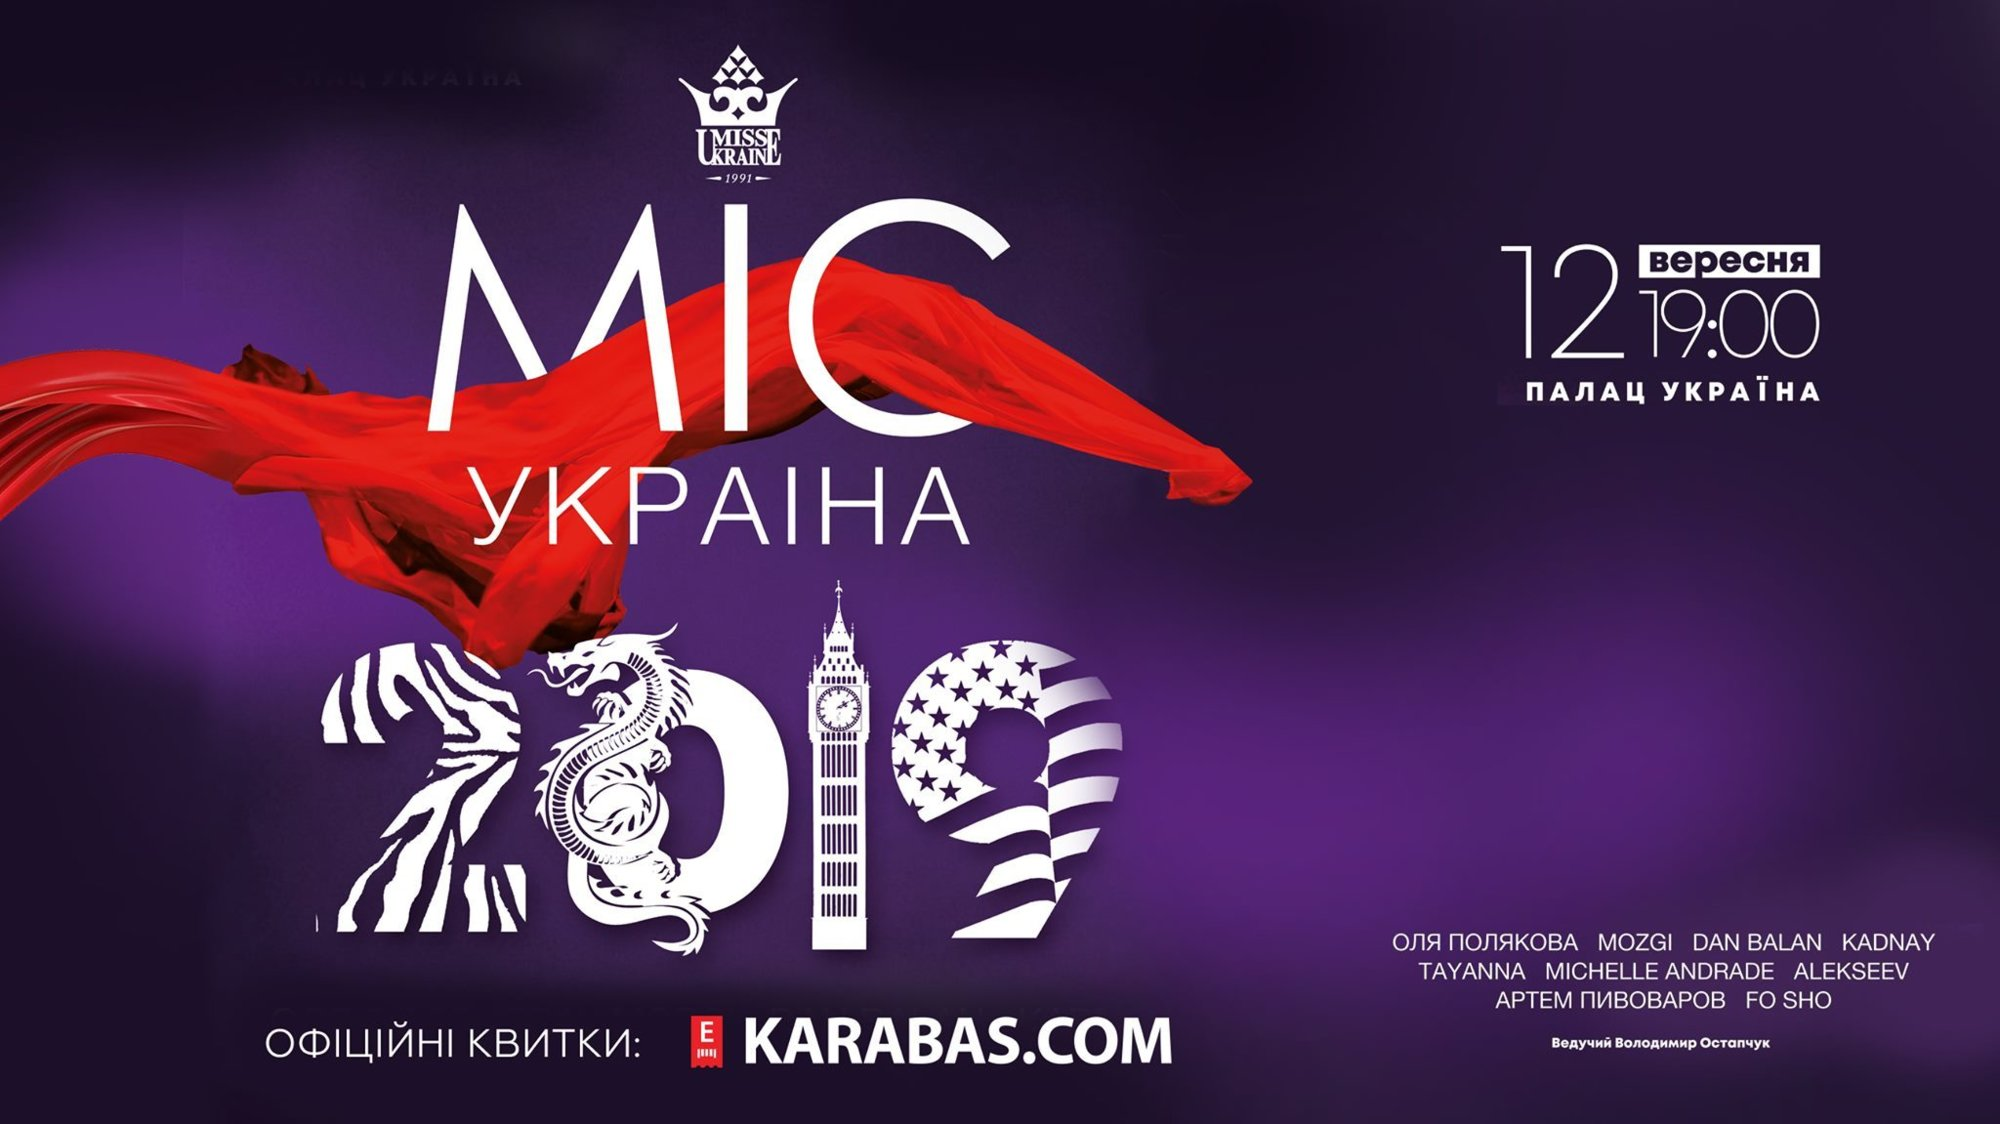 Miss Ukraine 2019 - Ukraine Palace - 103 Velyka Vasylkivska